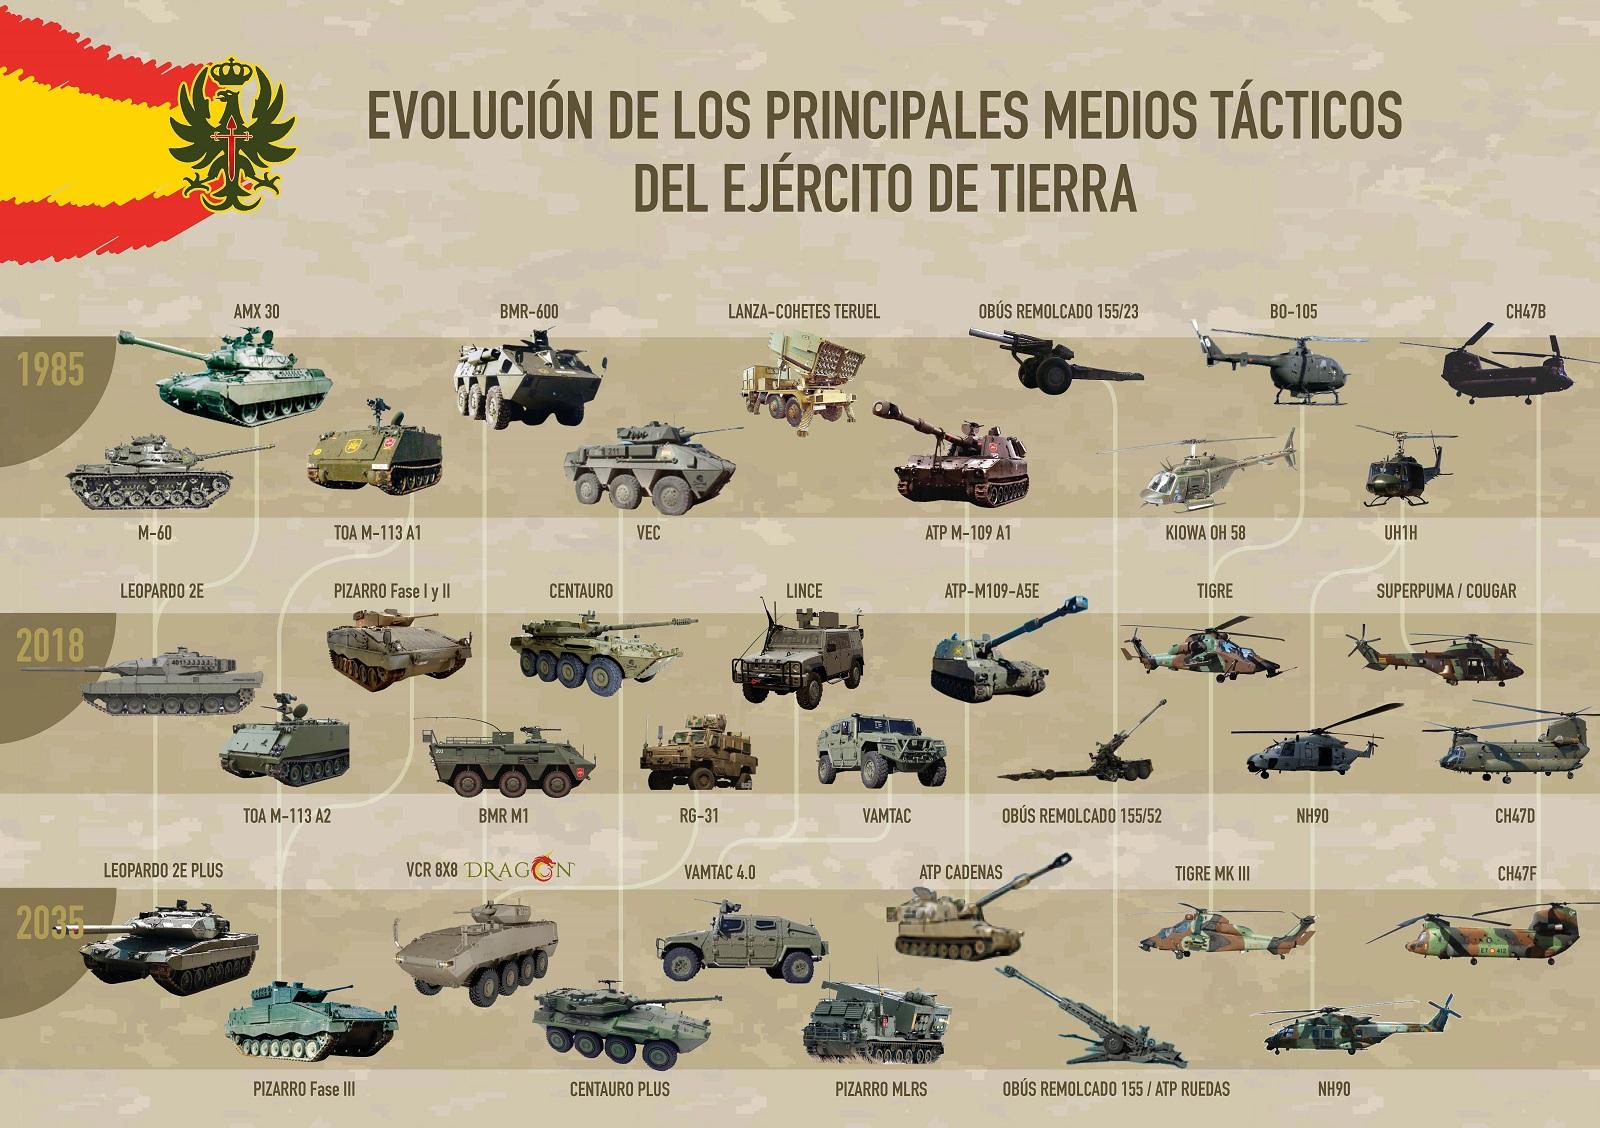 Armée Espagnole/Fuerzas Armadas Españolas - Page 5 47259779881_bbdd3a784a_o